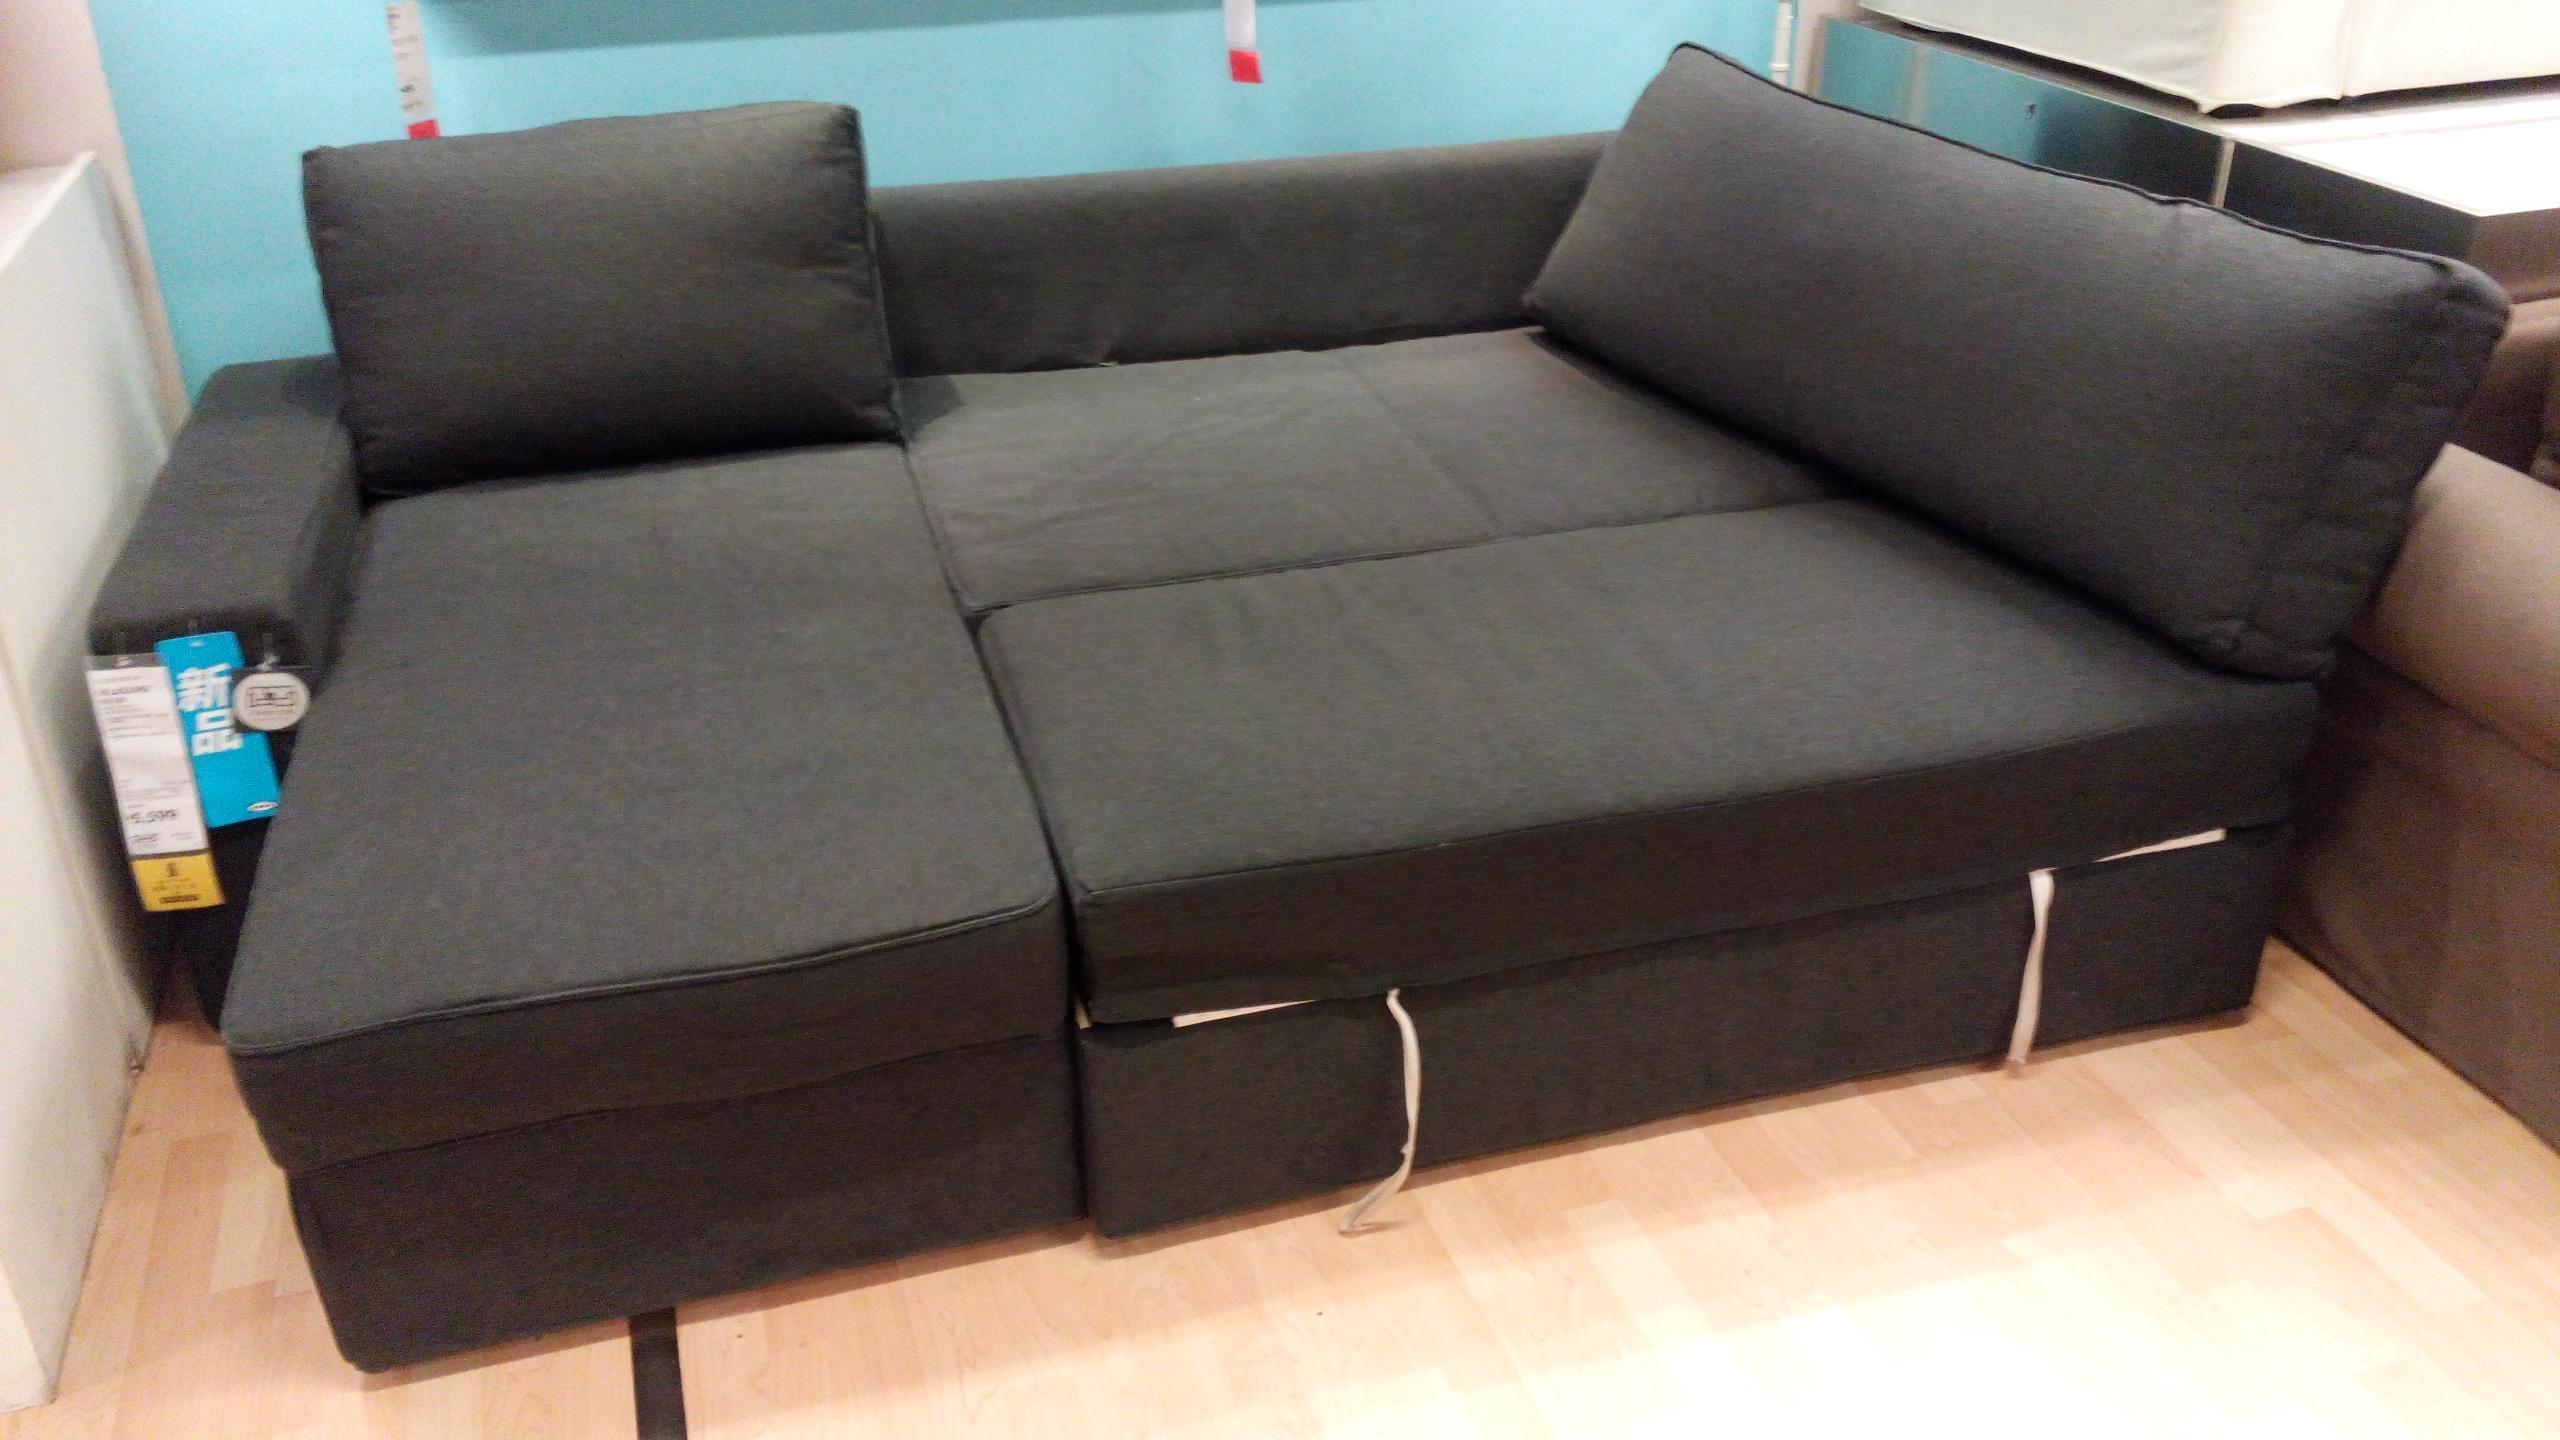 White Sleeper Sofa Ikea | Tehranmix Decoration With Sleeper Sofas Ikea (Image 20 of 20)